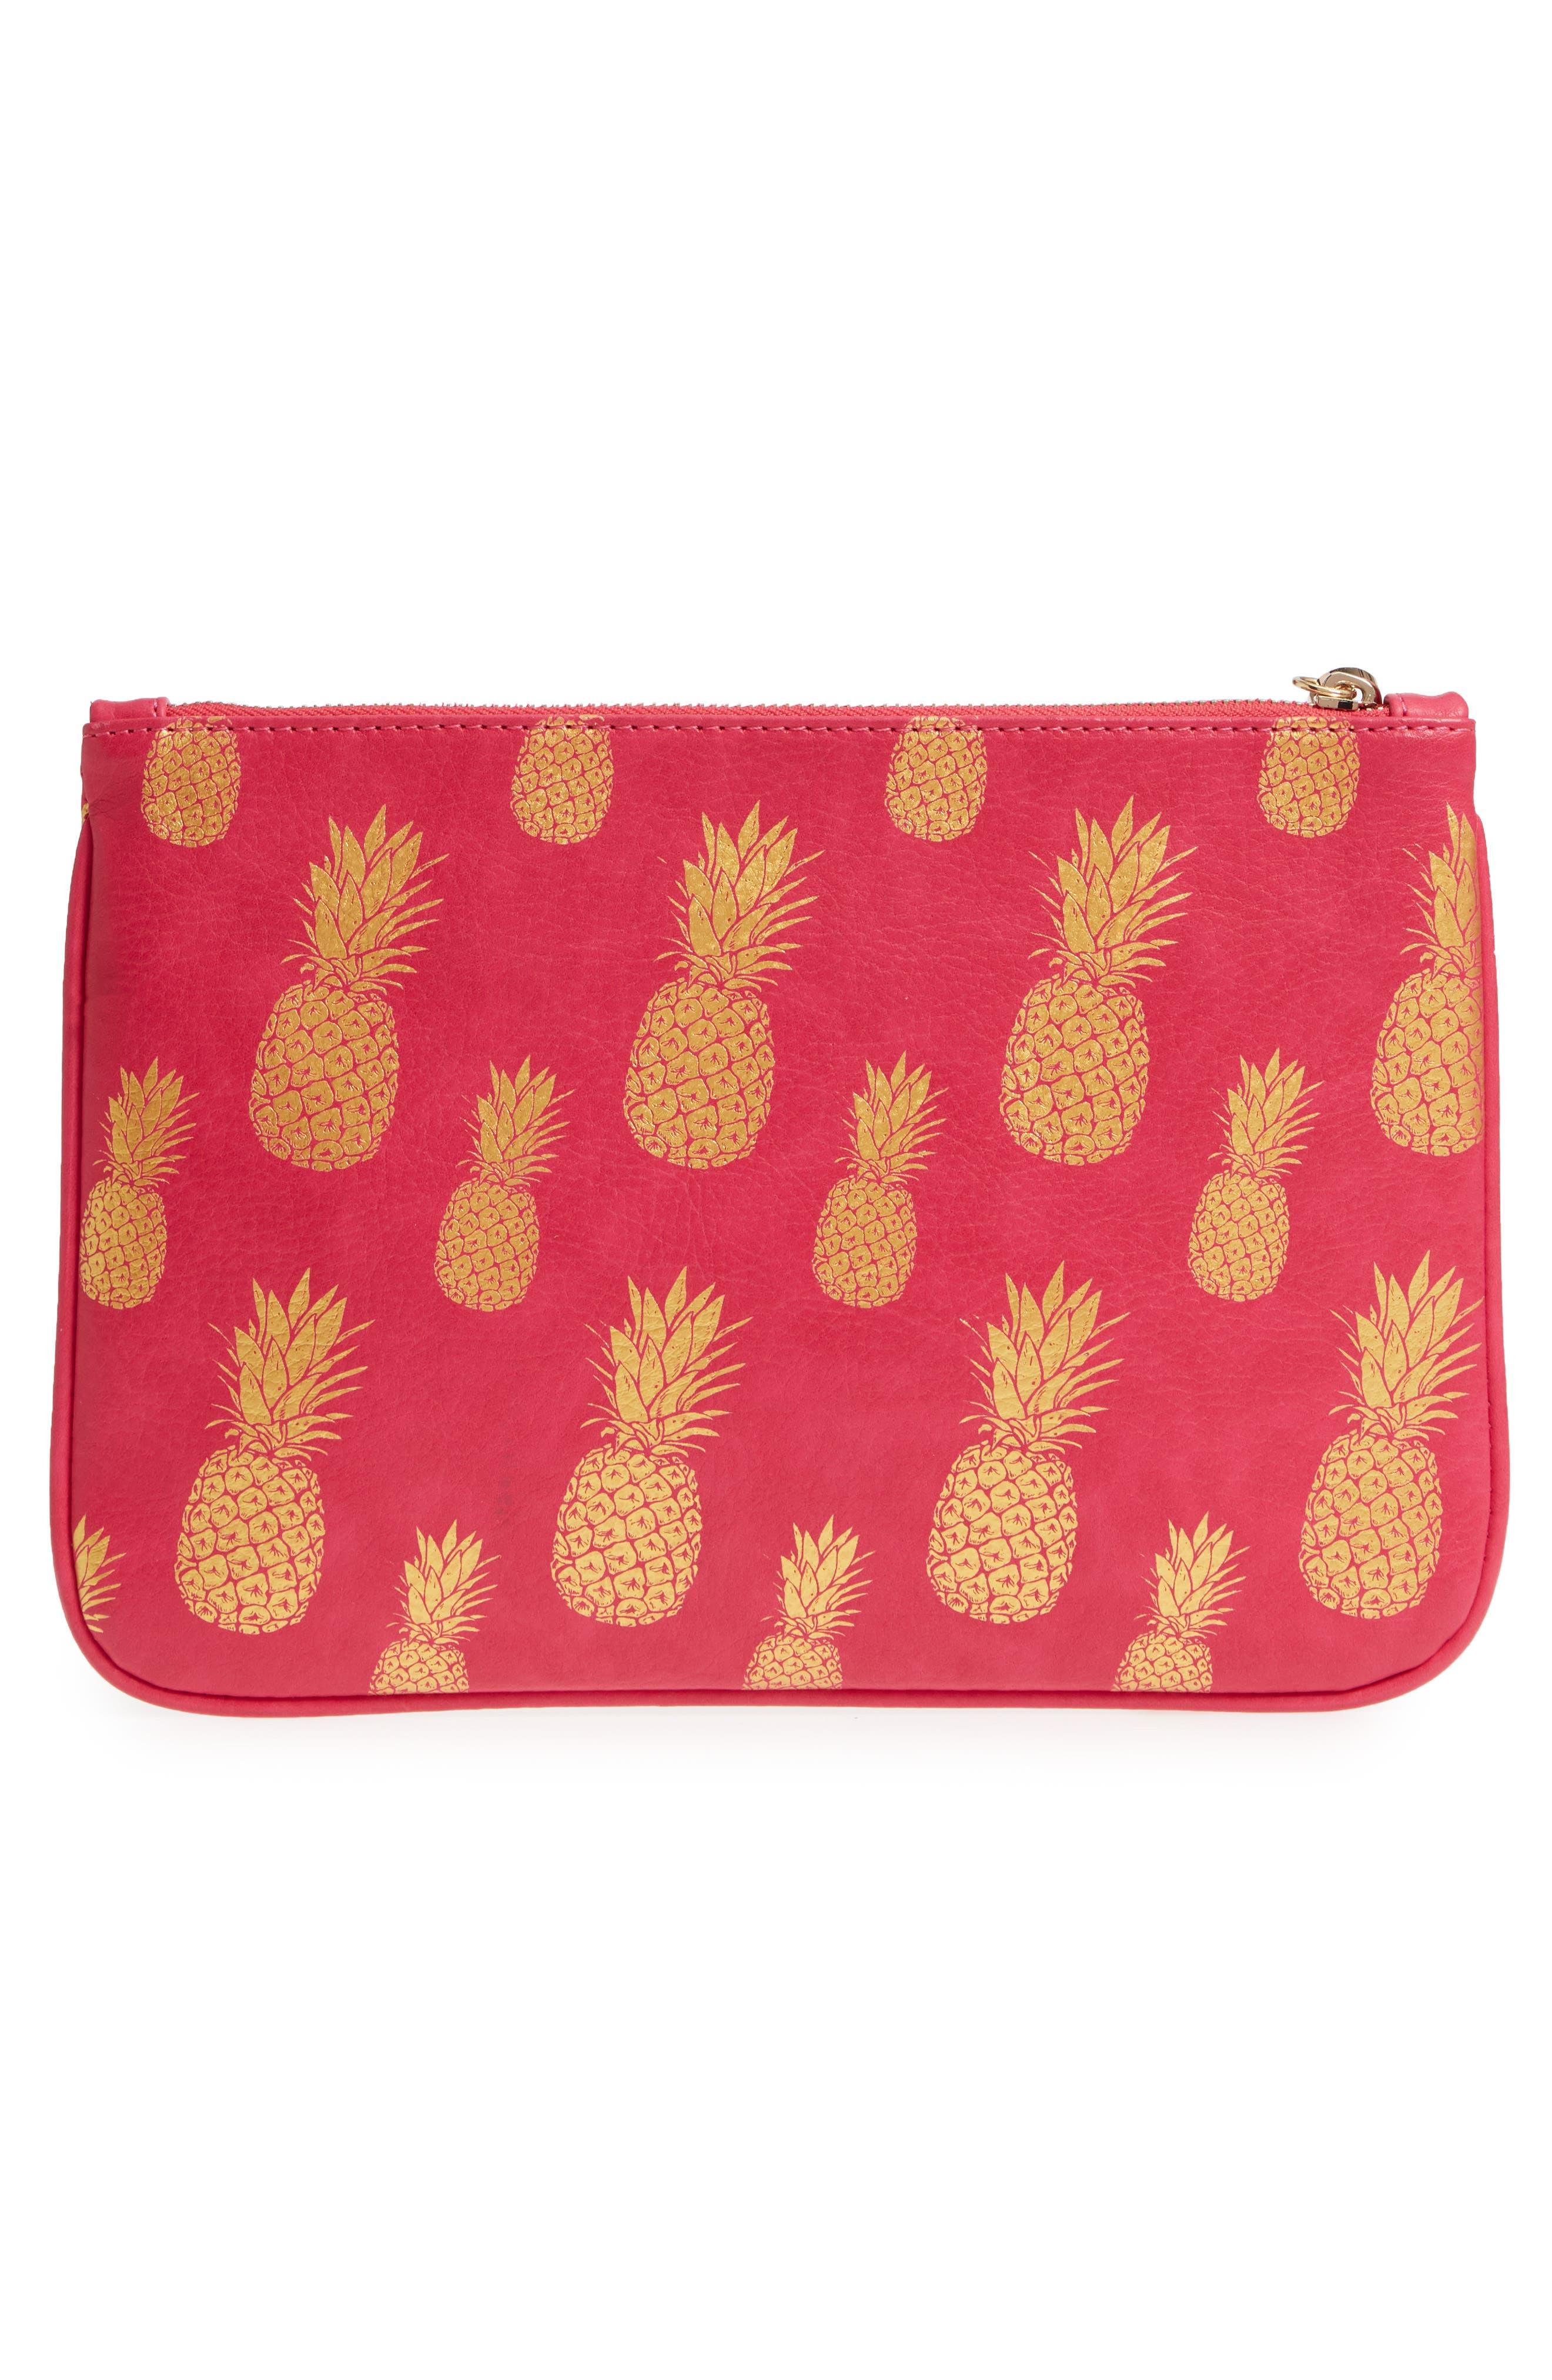 Mali + Lili Alice Pineapple Print Vegan Leather Clutch,                             Alternate thumbnail 3, color,                             HOT PINK